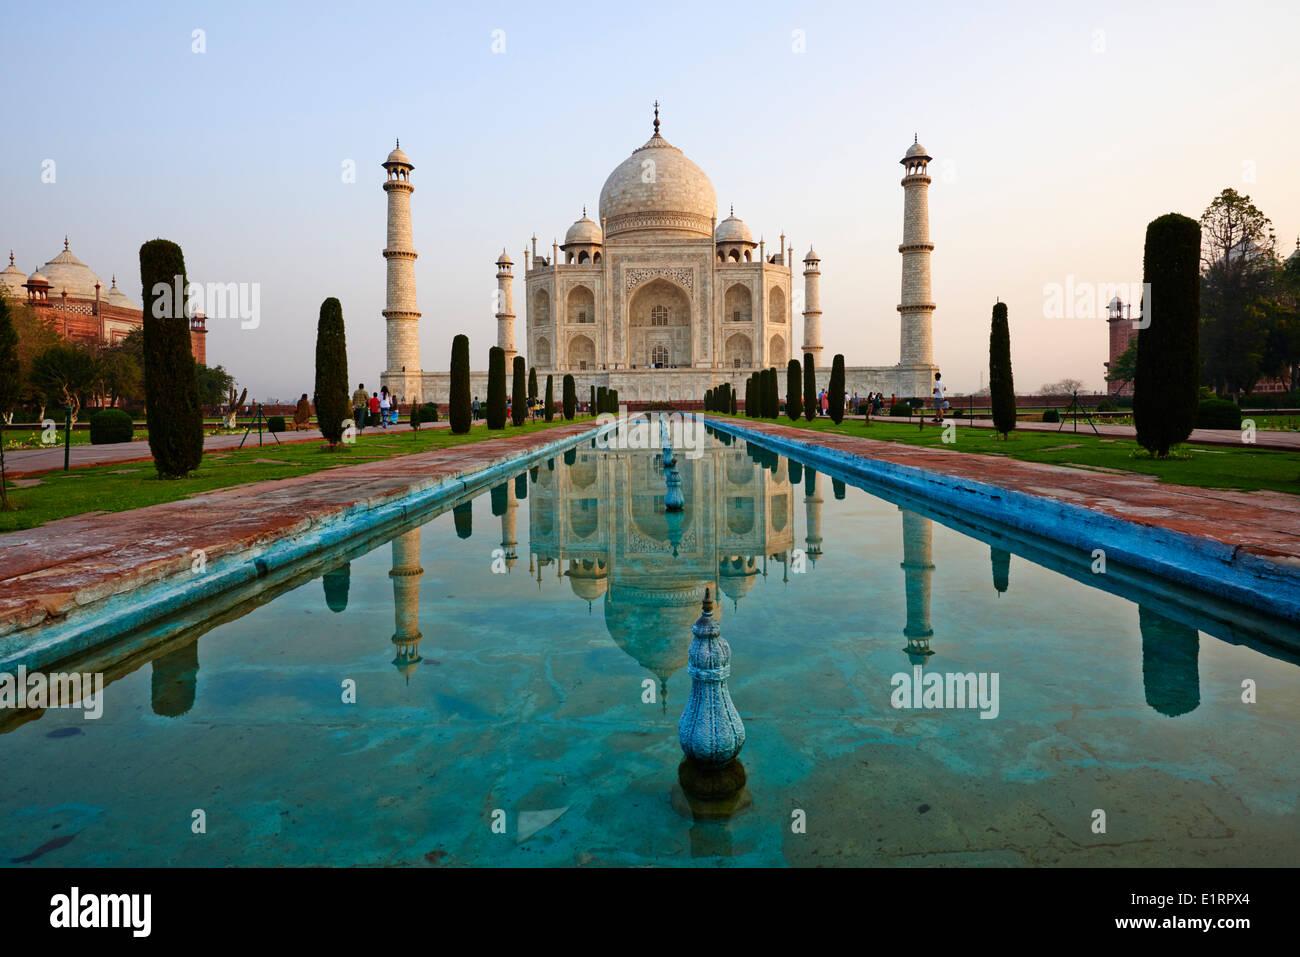 L'Inde, Uttar Pradesh State, Agra, Taj Mahal, Unesco world heritage Photo Stock